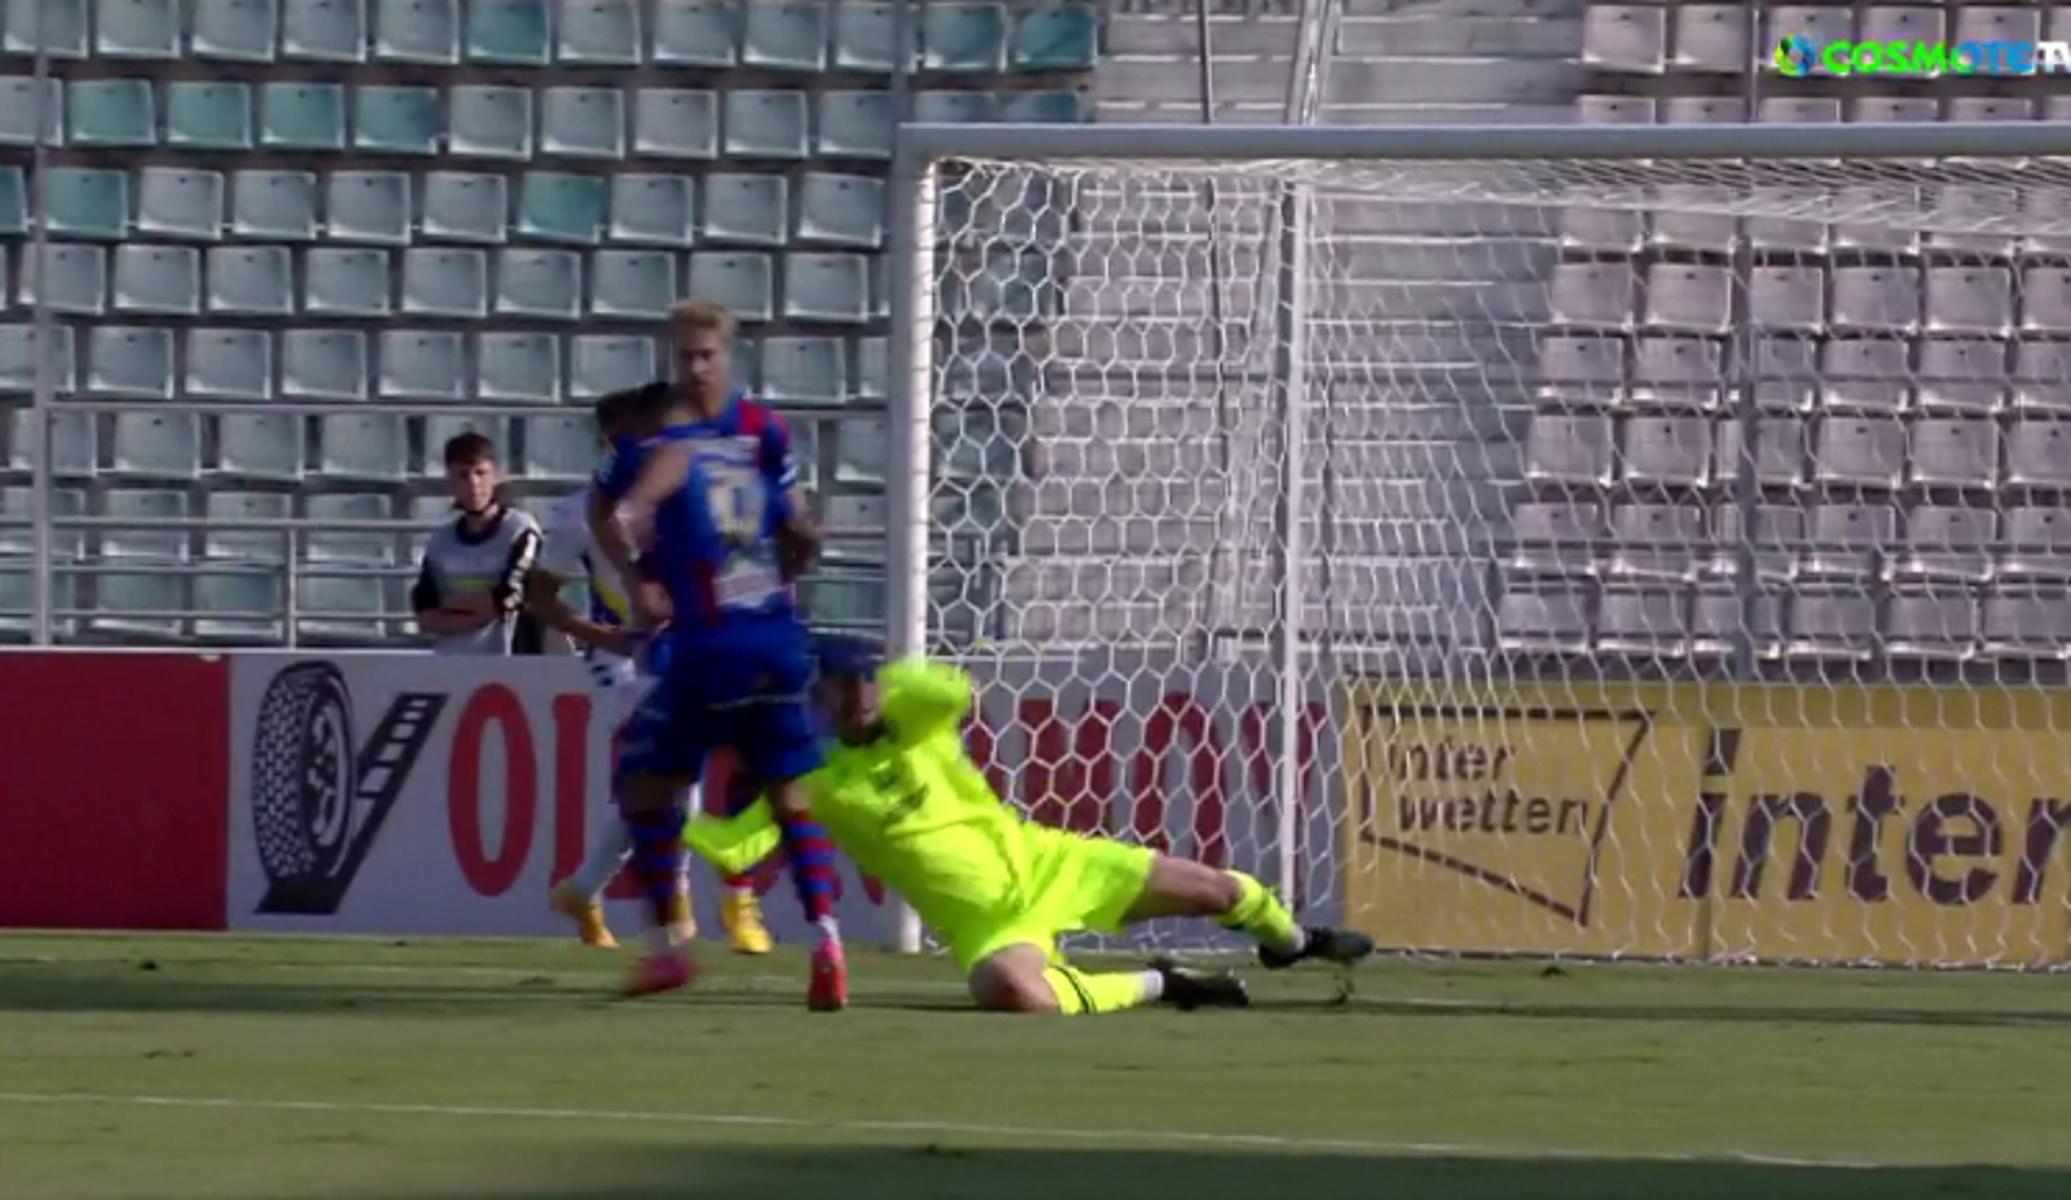 Superleague 1, Βόλος – Αστέρας Τρίπολης: Νέα «γκάφα» από Παπαδόπουλο και γκολ